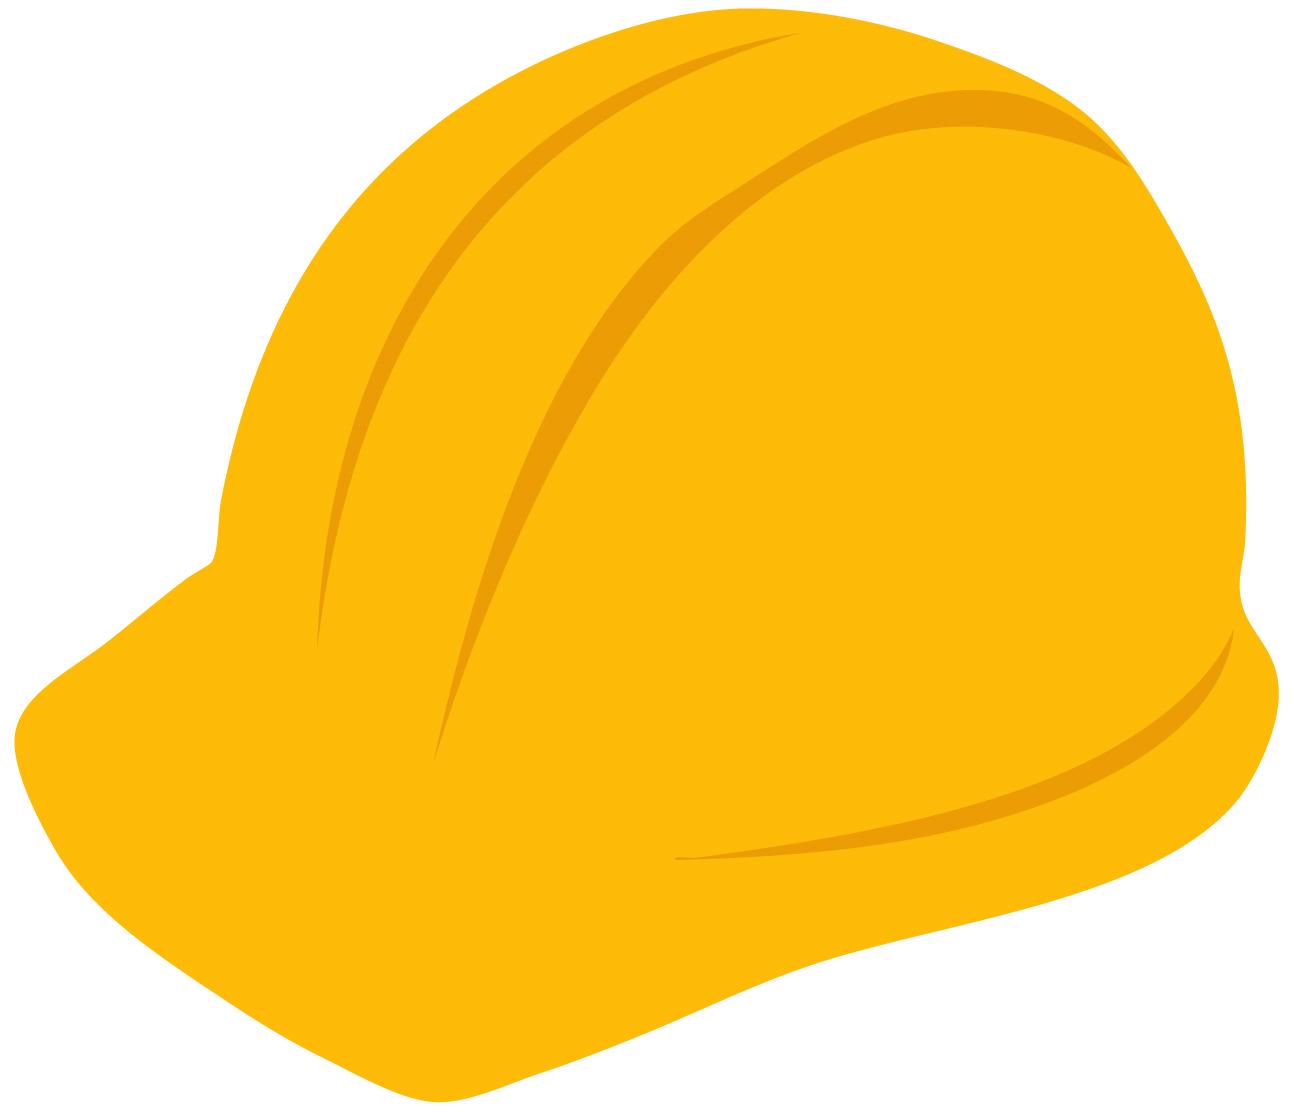 1294x1118 Hard Hat Icons